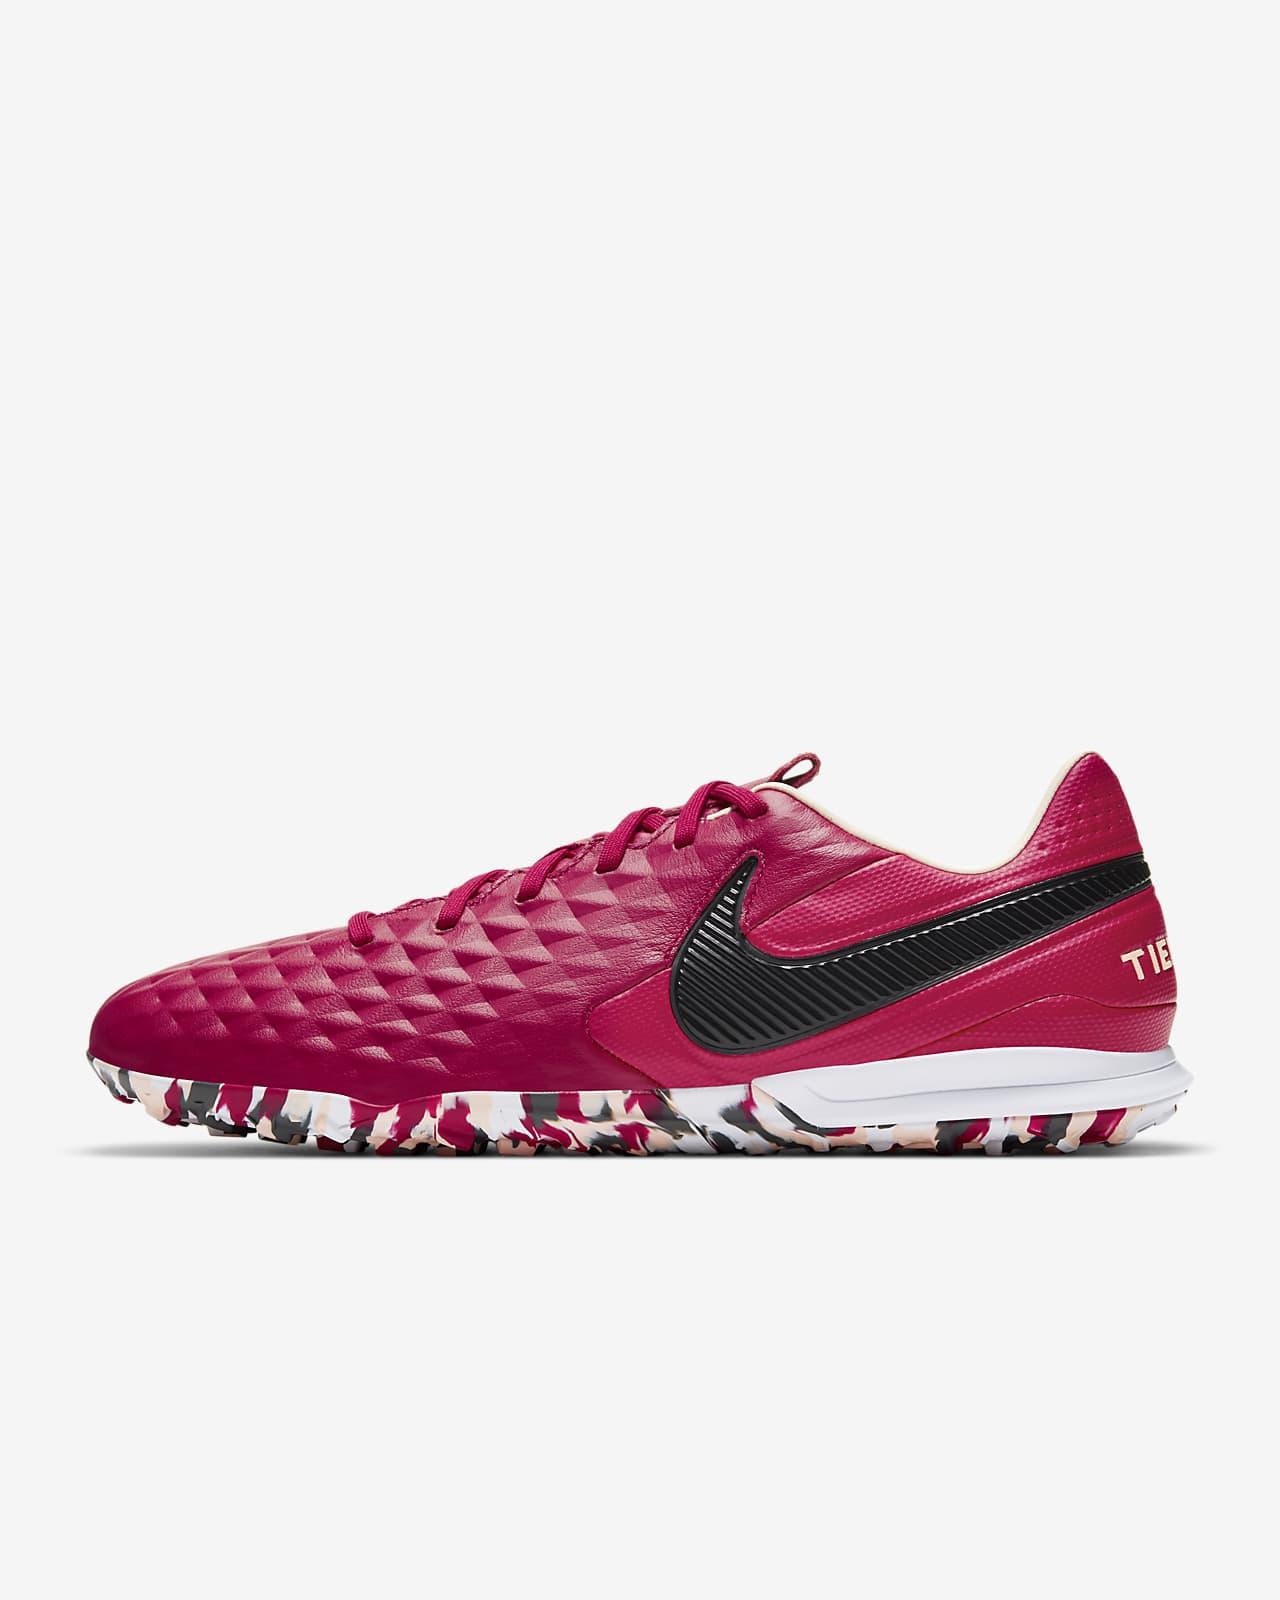 Chaussure de football pour surface synthétique Nike Tiempo Legend 8 Pro TF